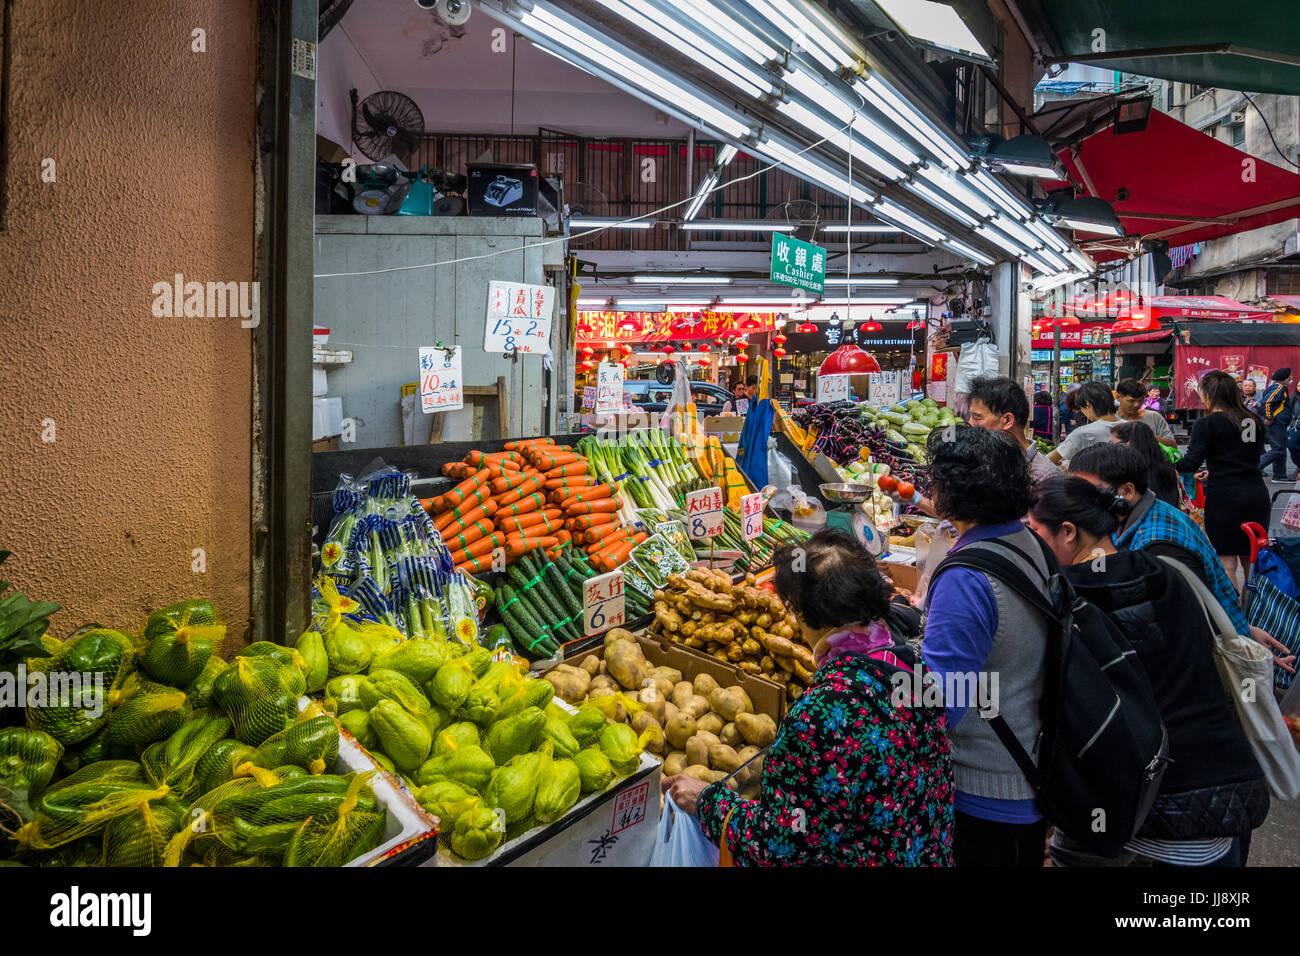 Greengrocer's Shop, Wan Chai, Hong Kong - Stock Image